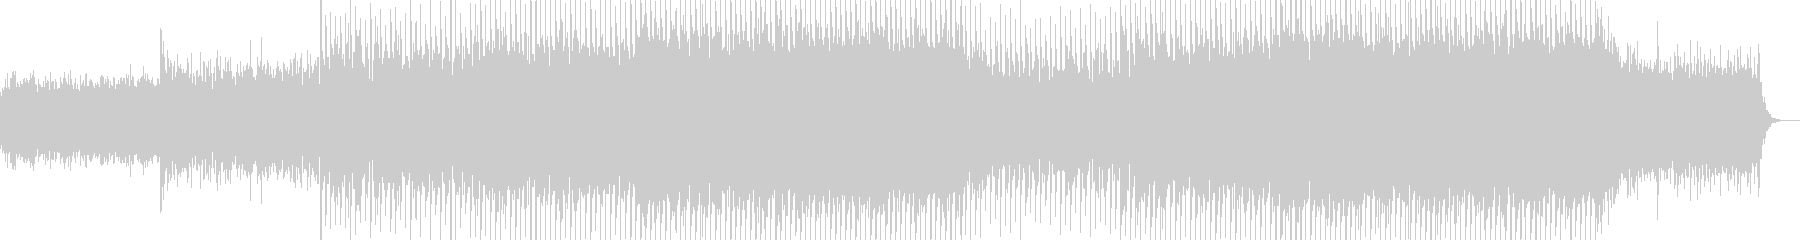 EDMポップで明るいクラブ系-39の未再生の波形